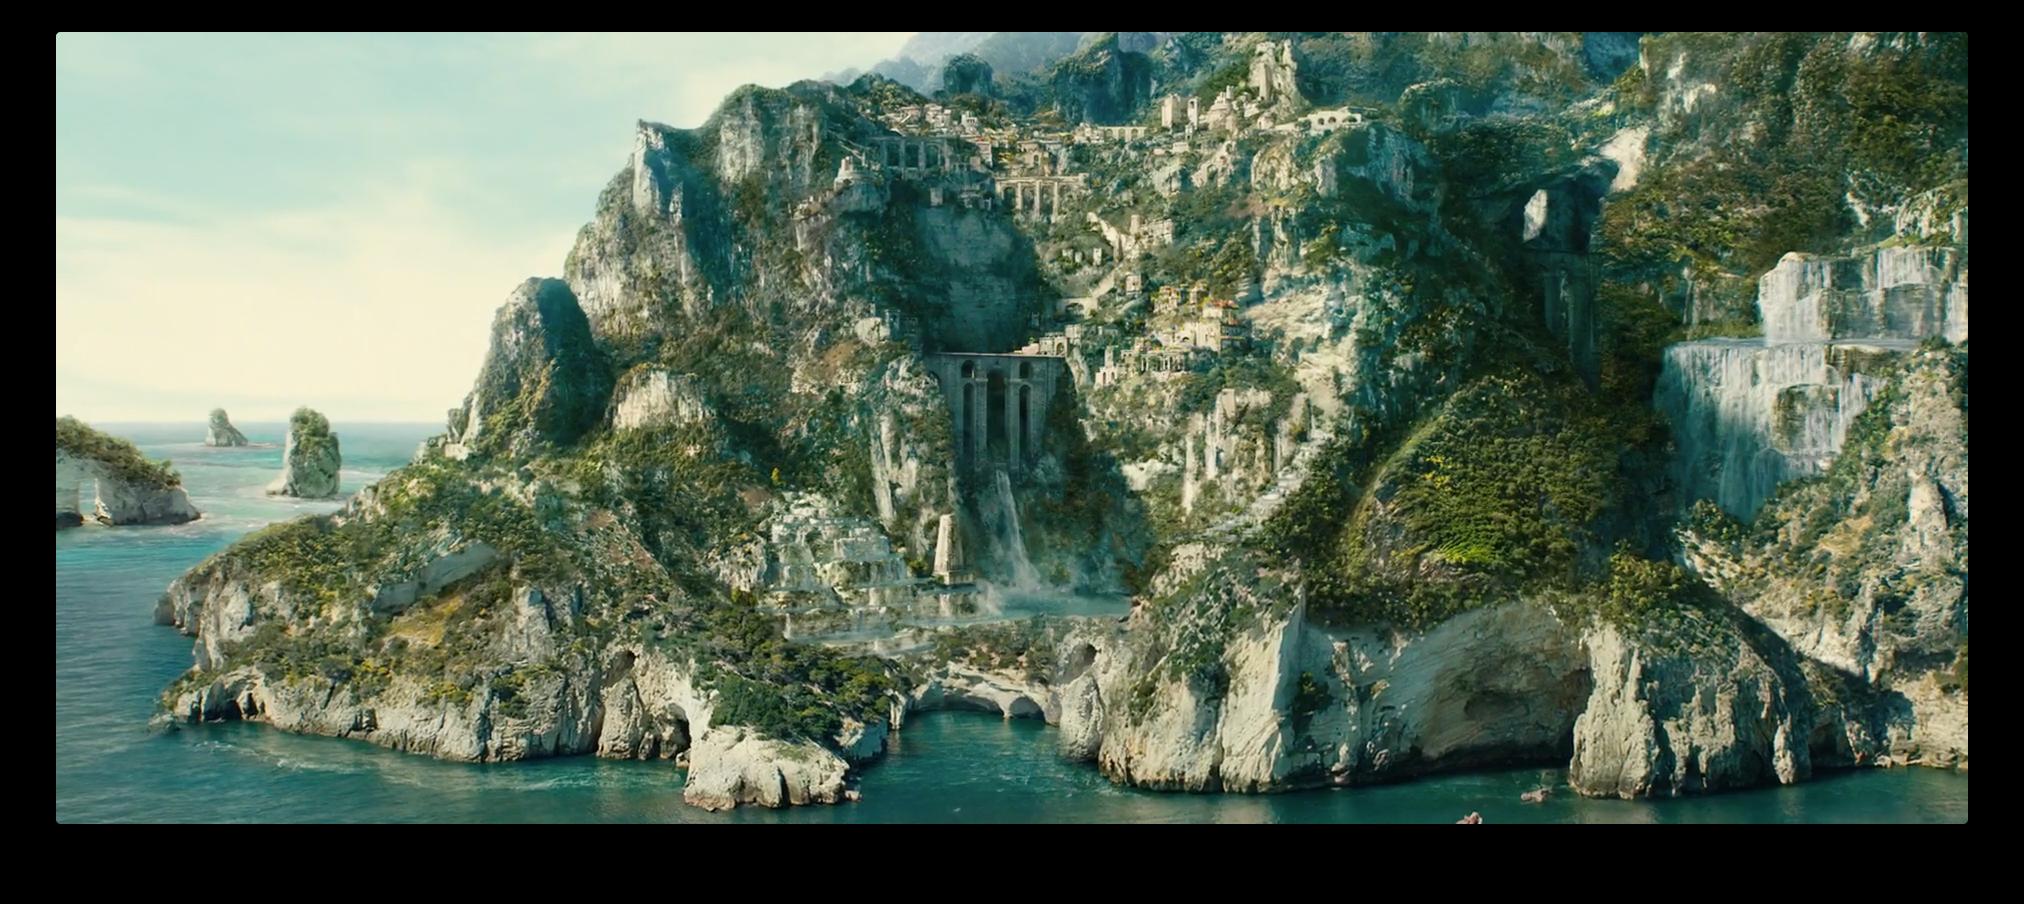 Themyscira - Paradise Island - Wonder Woman